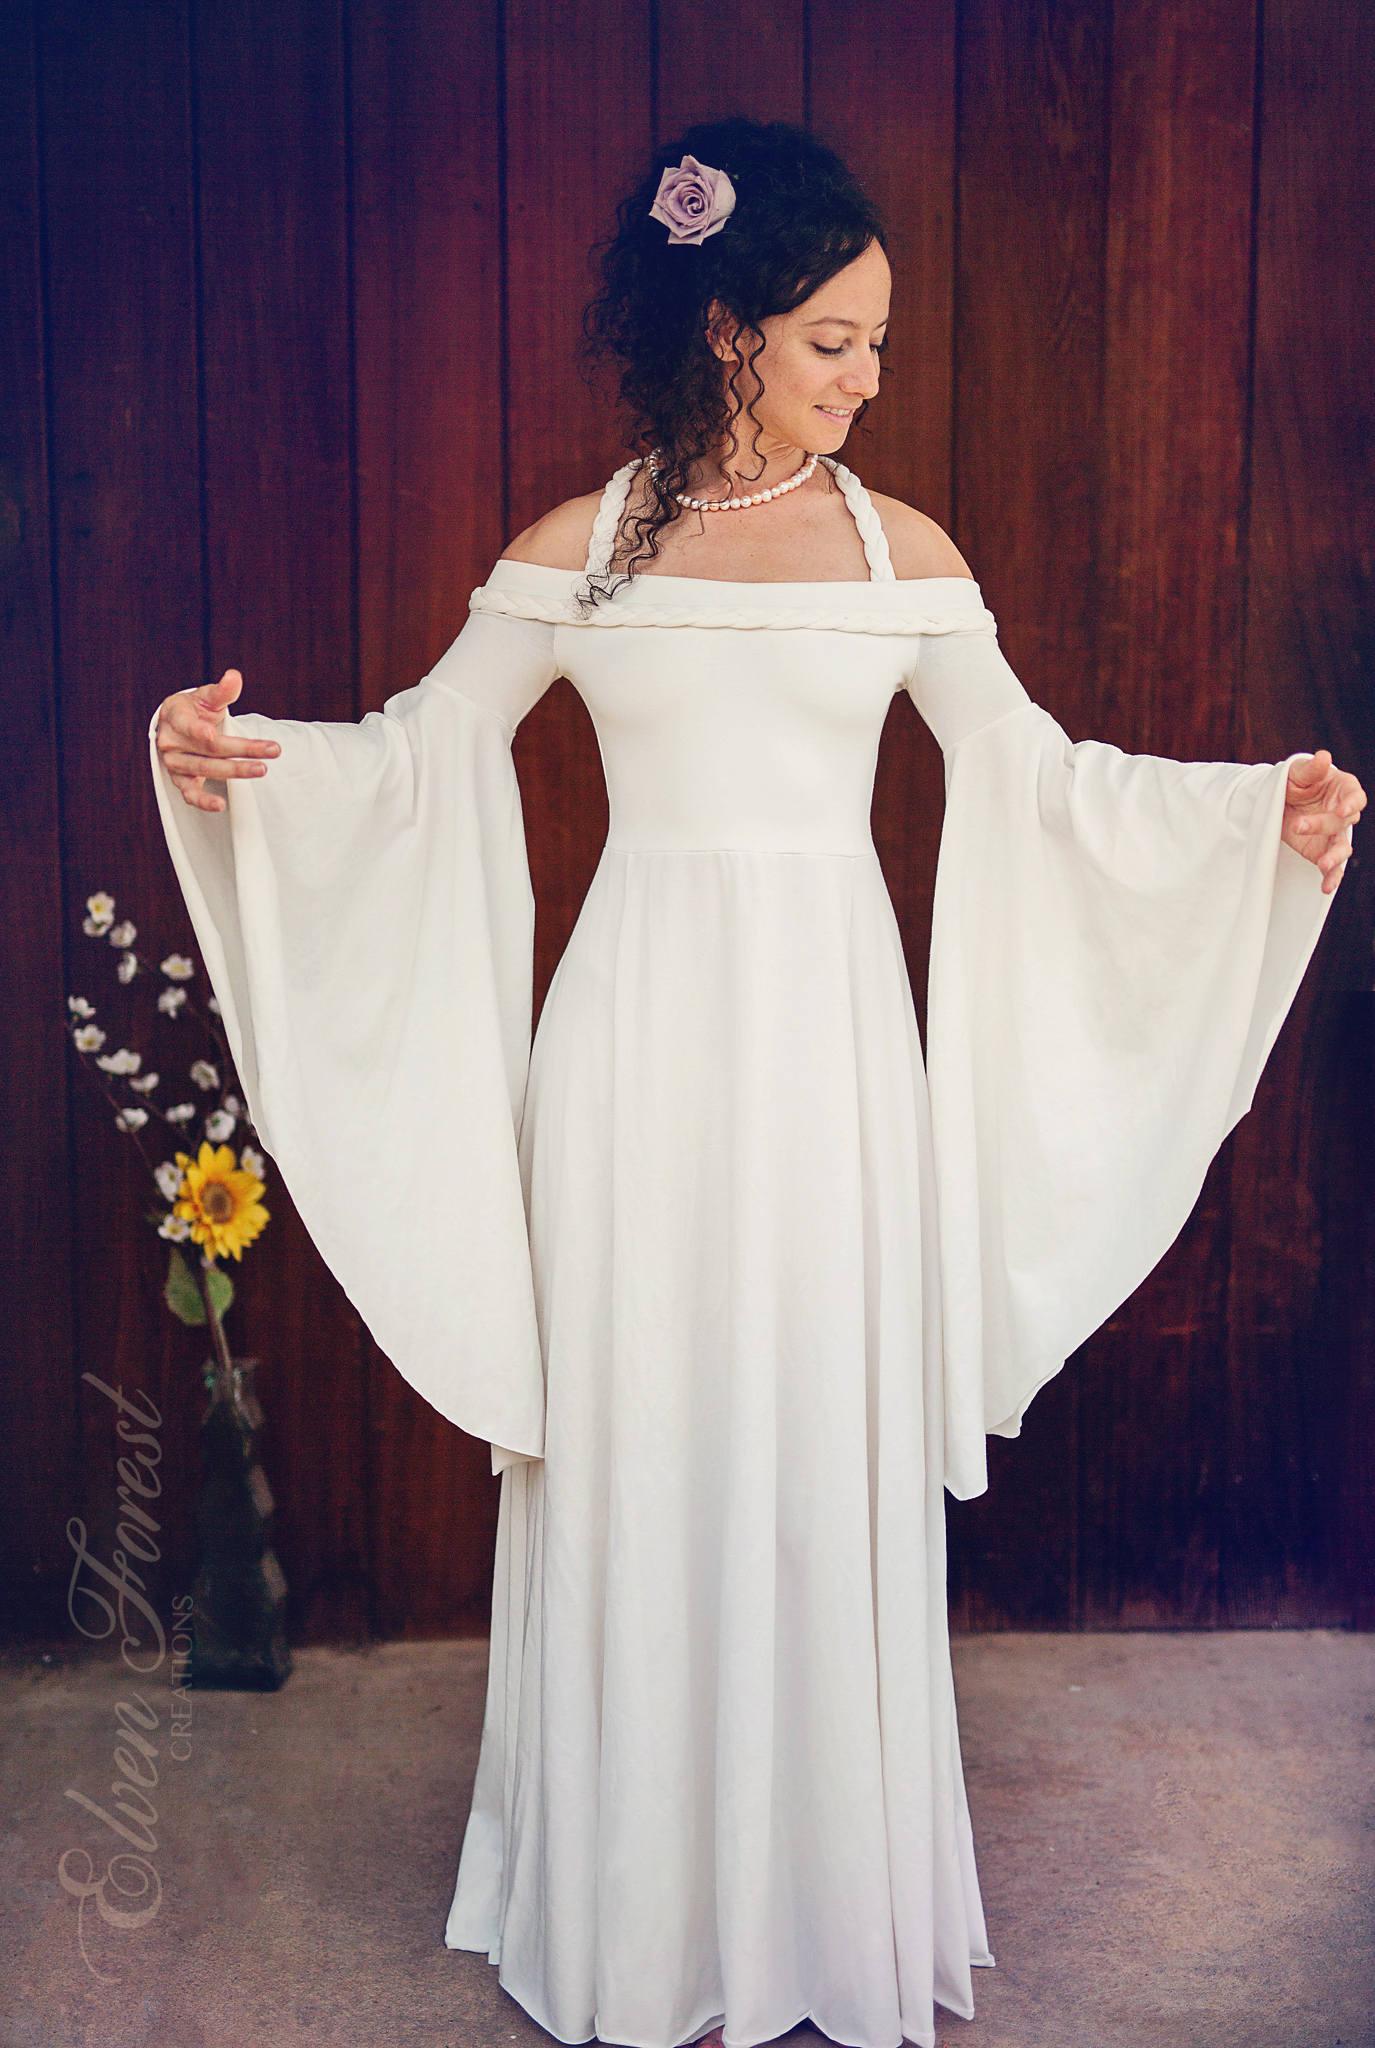 Fairytale Wedding Dress ~ Elven Forest, Bride, Bohemian, Gypsy ...